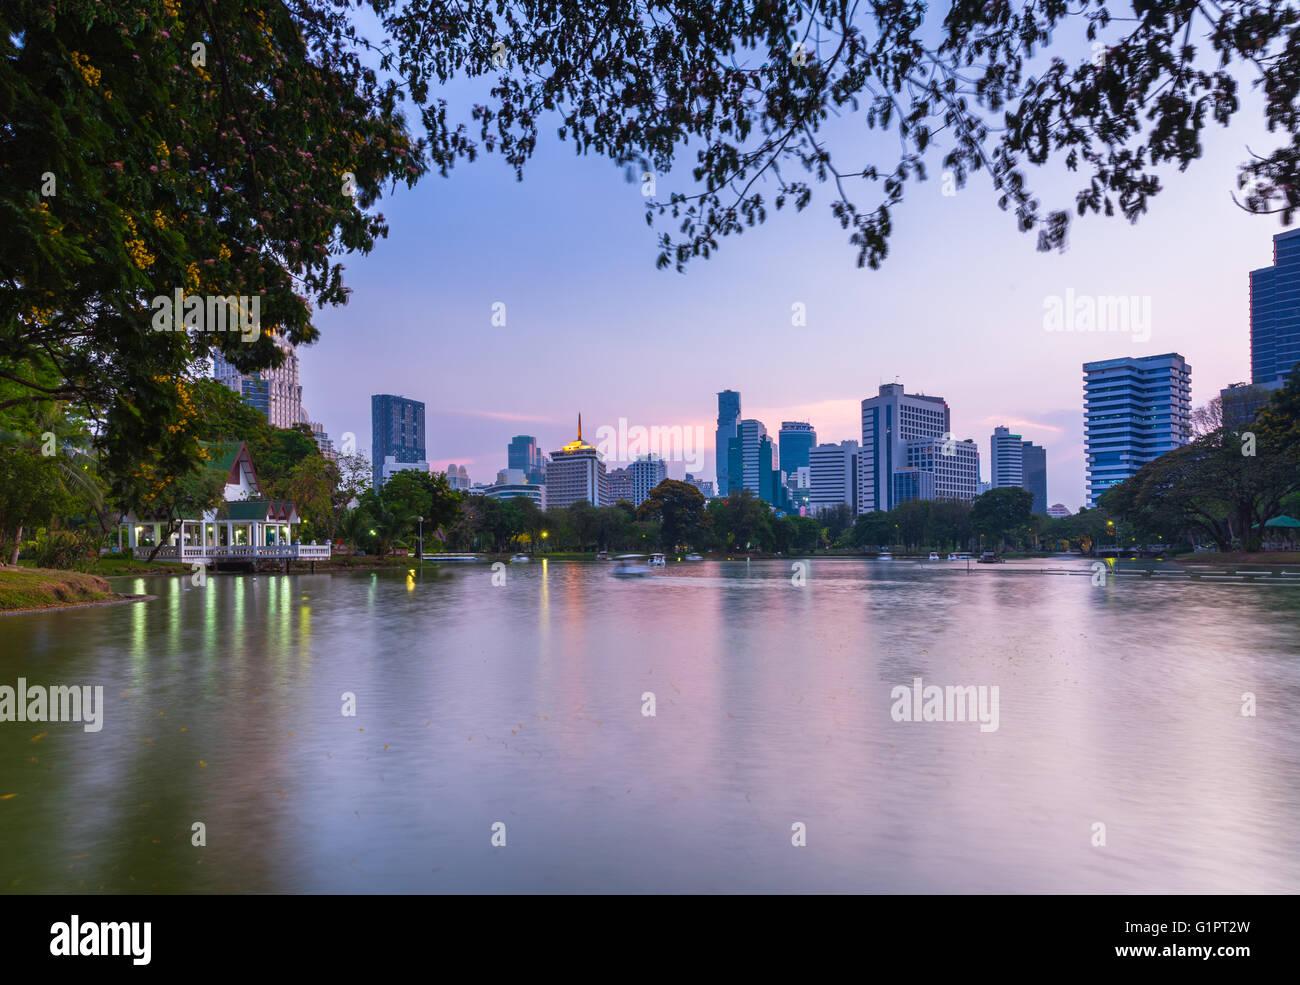 Sunset view of Bangkok skyline in Lumpini public park, Bangkok, Thailand - Stock Image